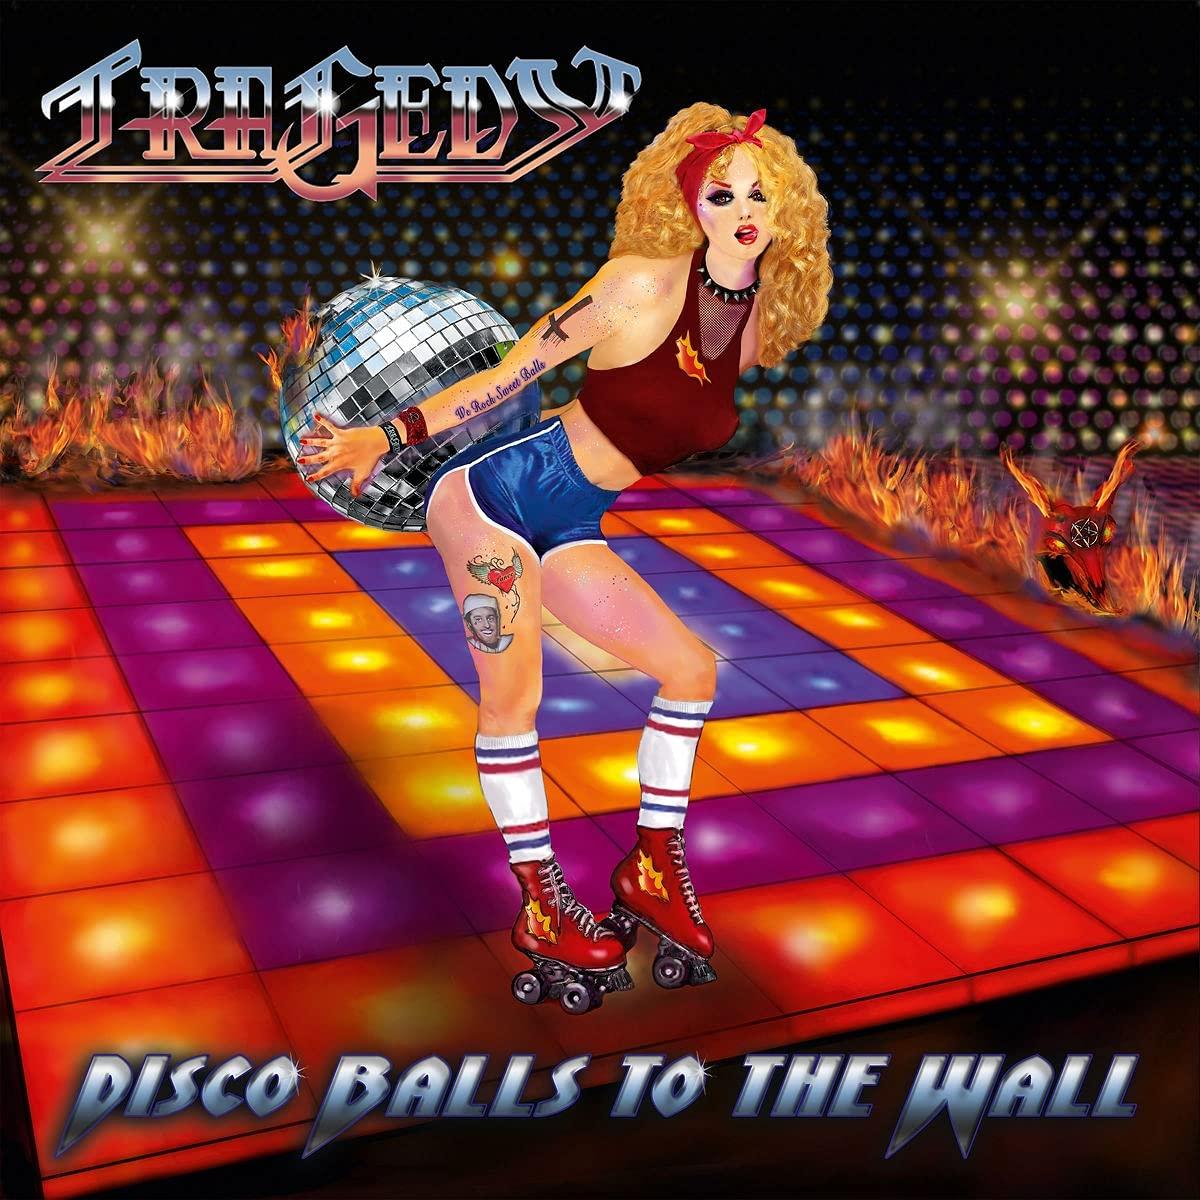 Tragedy Feat. Alex Skolnick – Disco Balls To The Wall (2021) [FLAC]